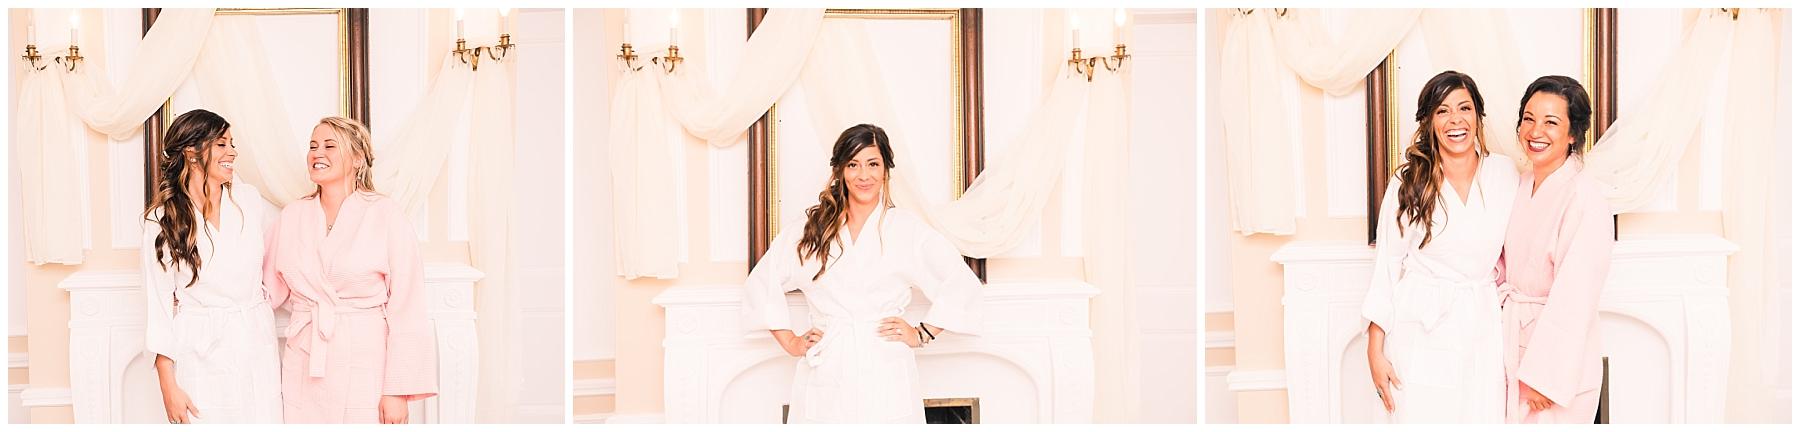 lafayette indiana wedding photography destination wedding fowler house mansion_0015.jpg